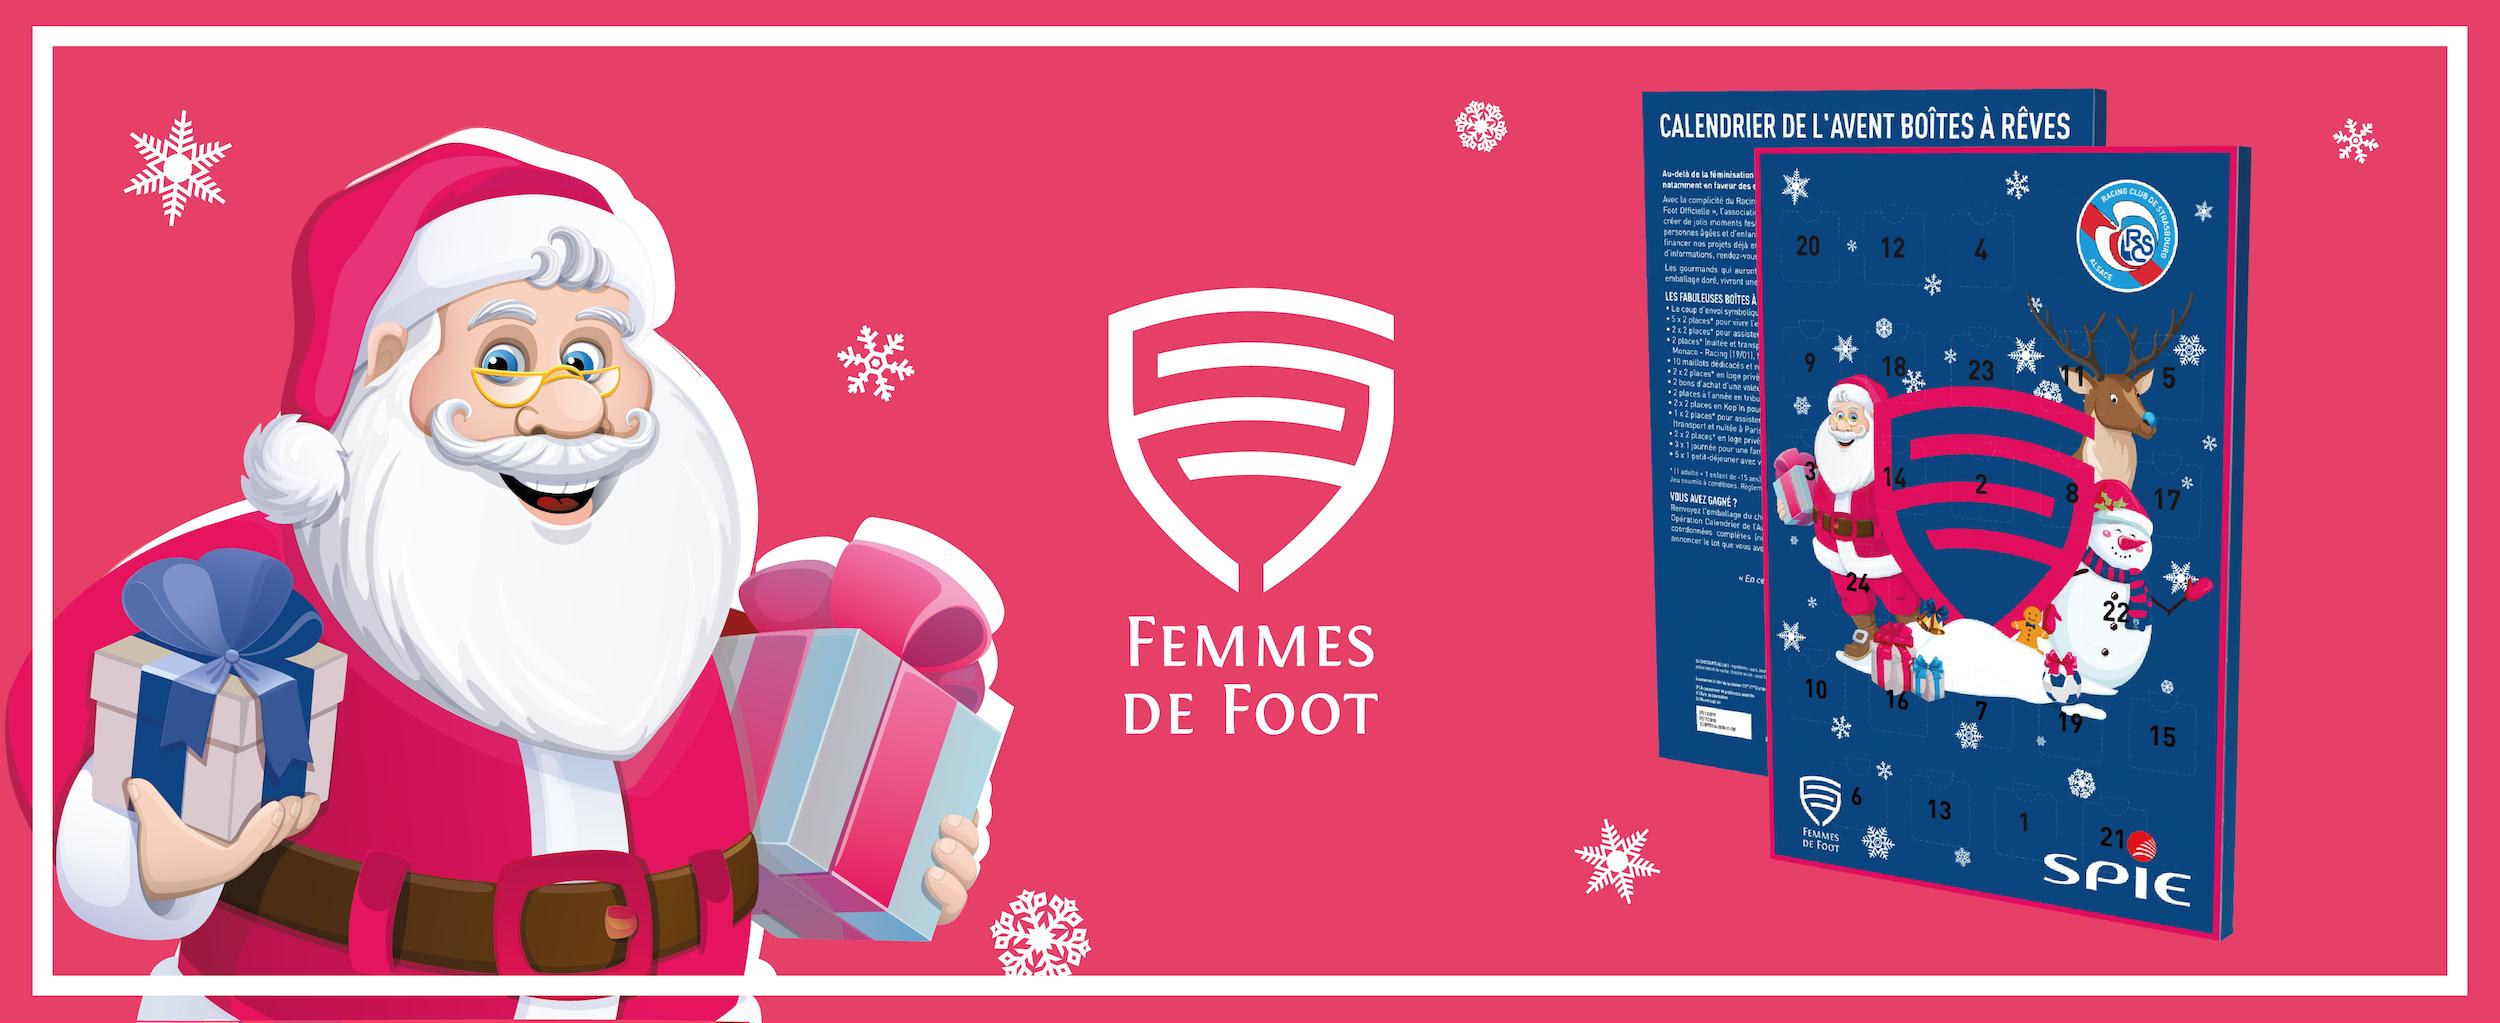 Calendrier De Lavent Femmes De Foot